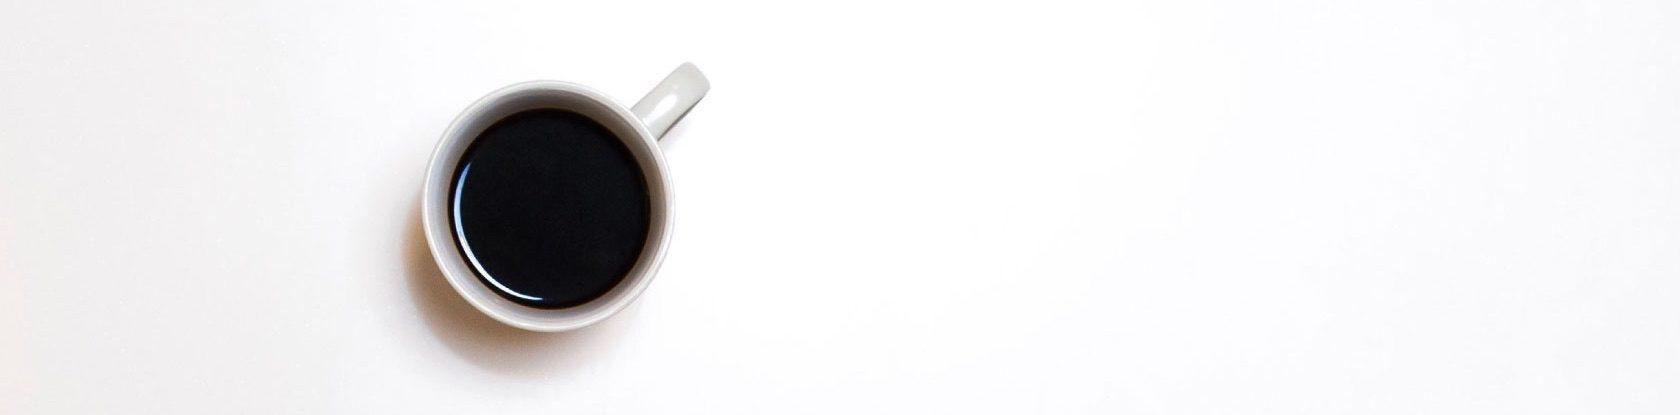 louisville-coffee-narrow